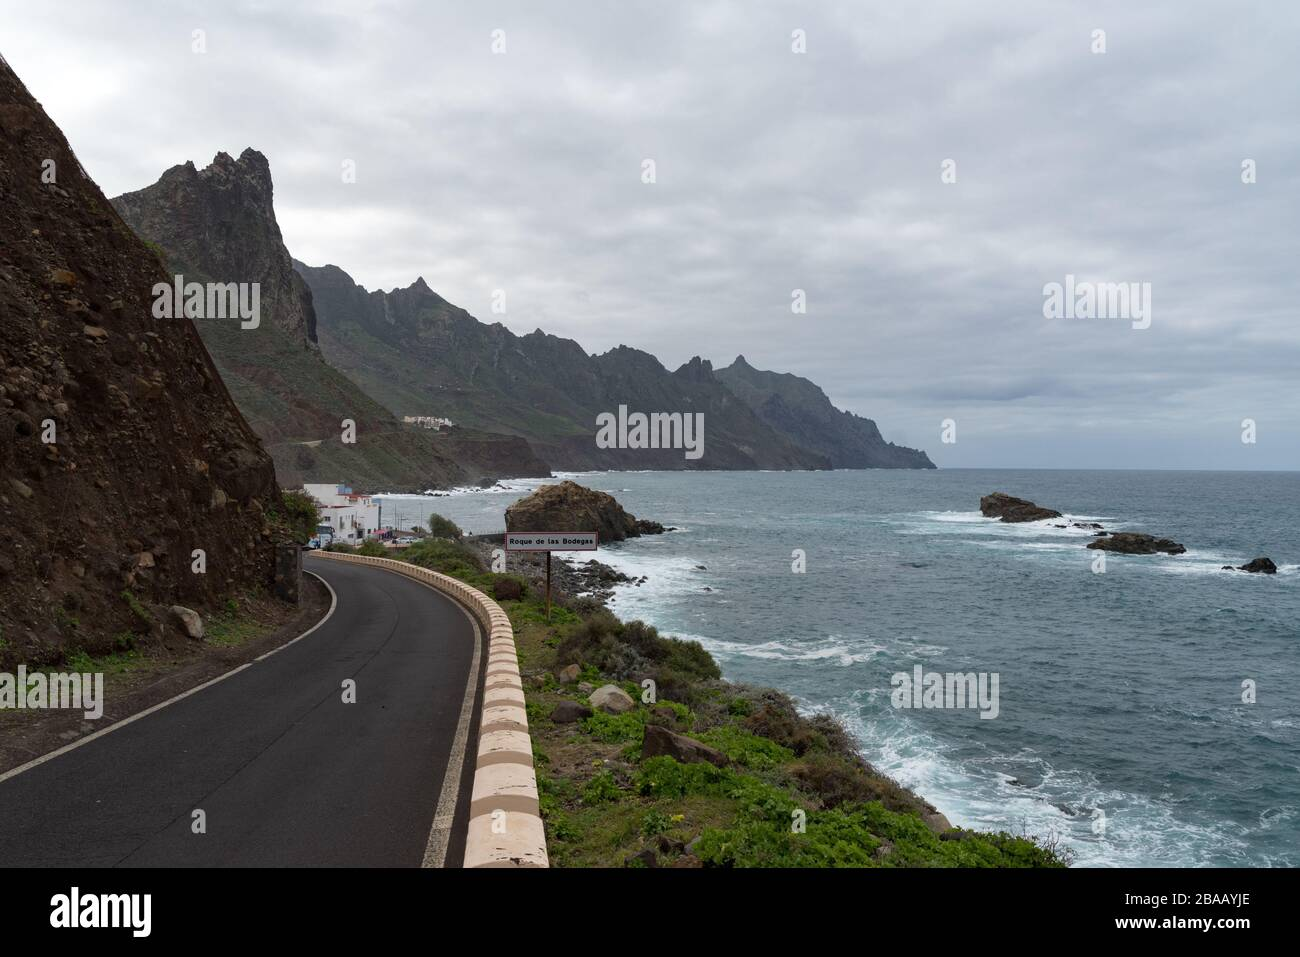 Roque de Las Bodegas, Tenerife,  -Jaunary 11, 2020: View to waves and cliff near Roque de Las Bodegas beach in the area of Taganana from coastline roa Stock Photo